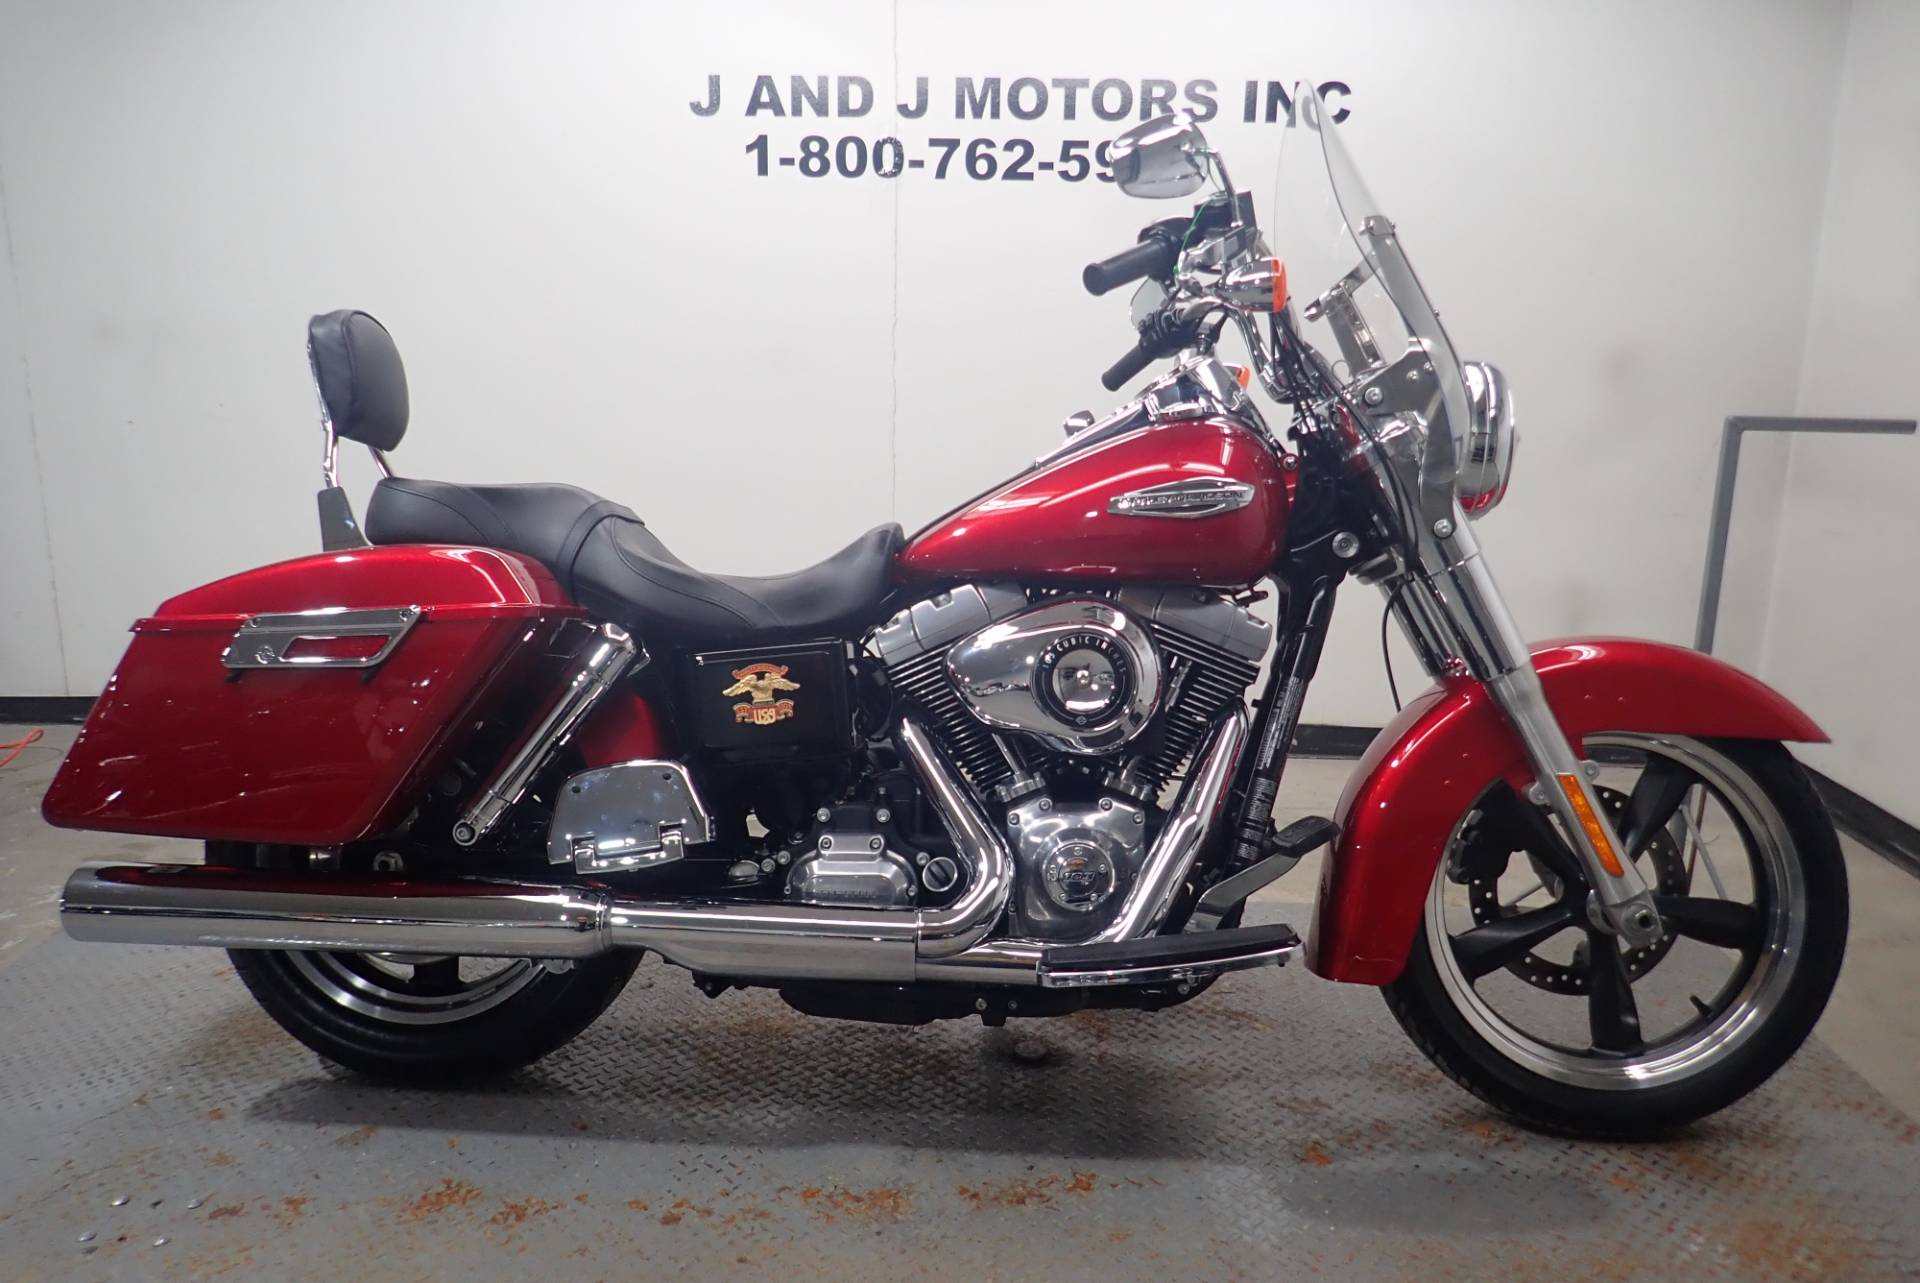 2012 Harley-Davidson Dyna Switchback 1